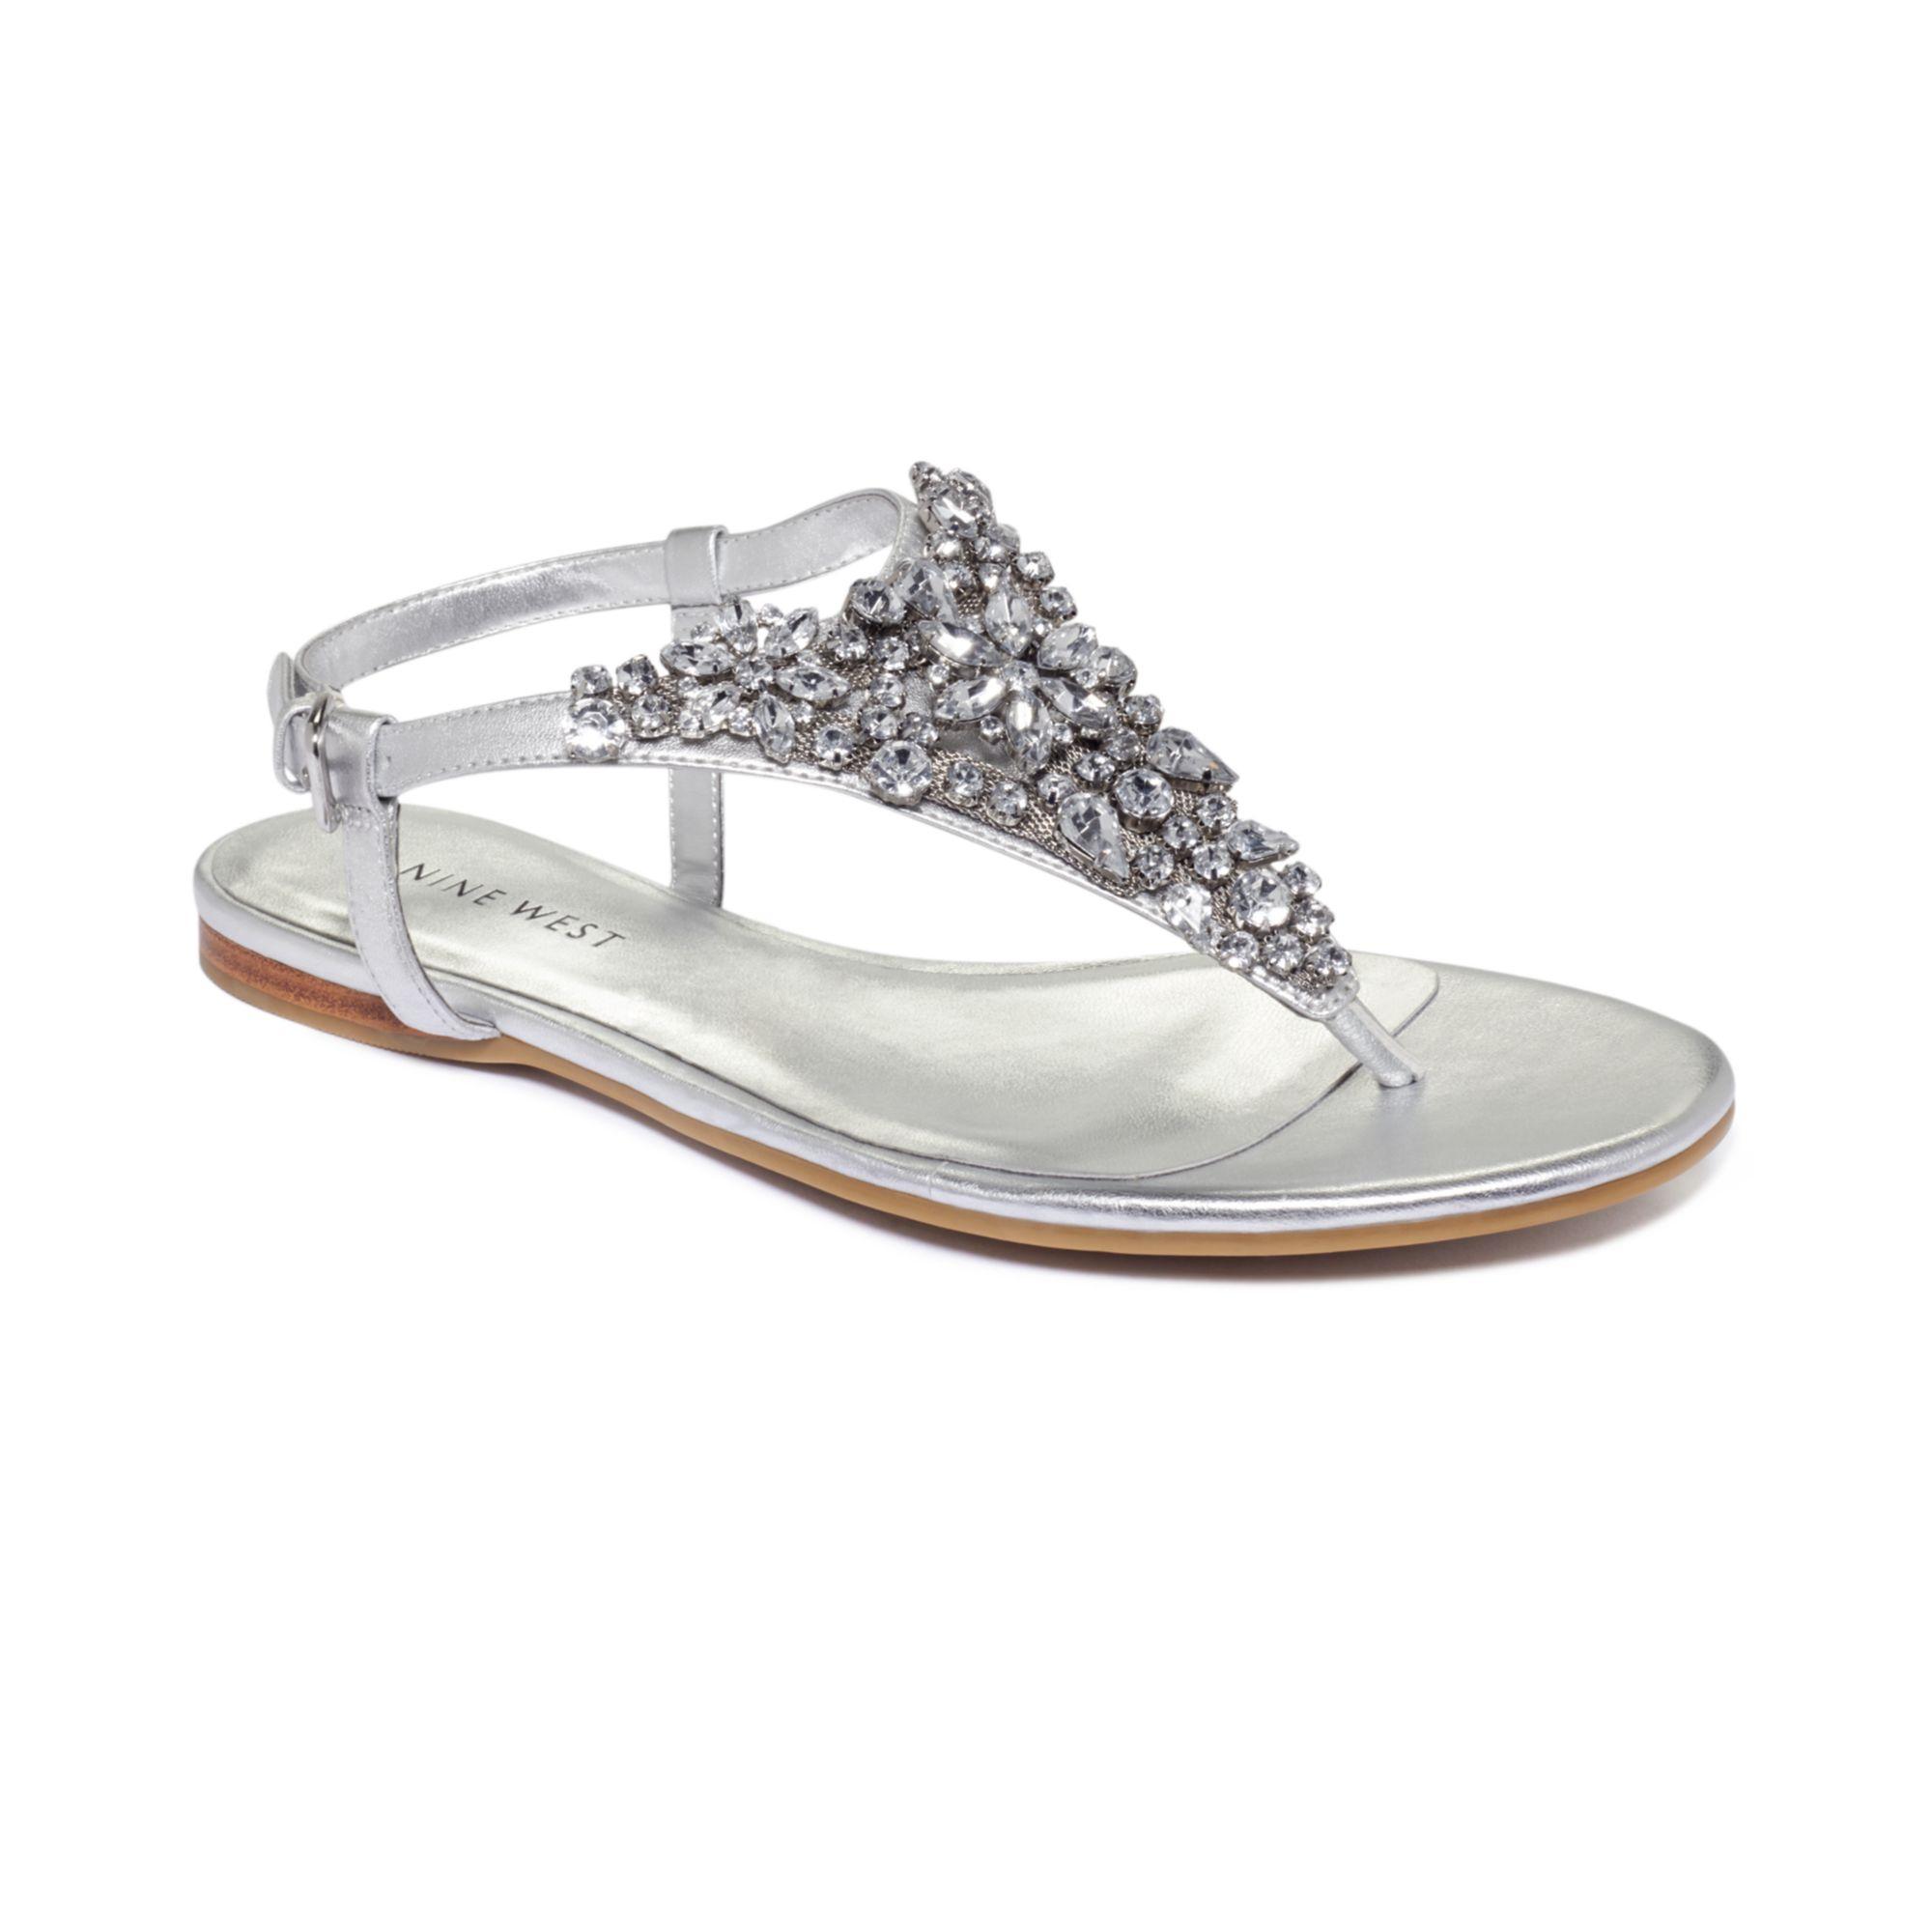 Nine West Seahorse Flat Sandals in